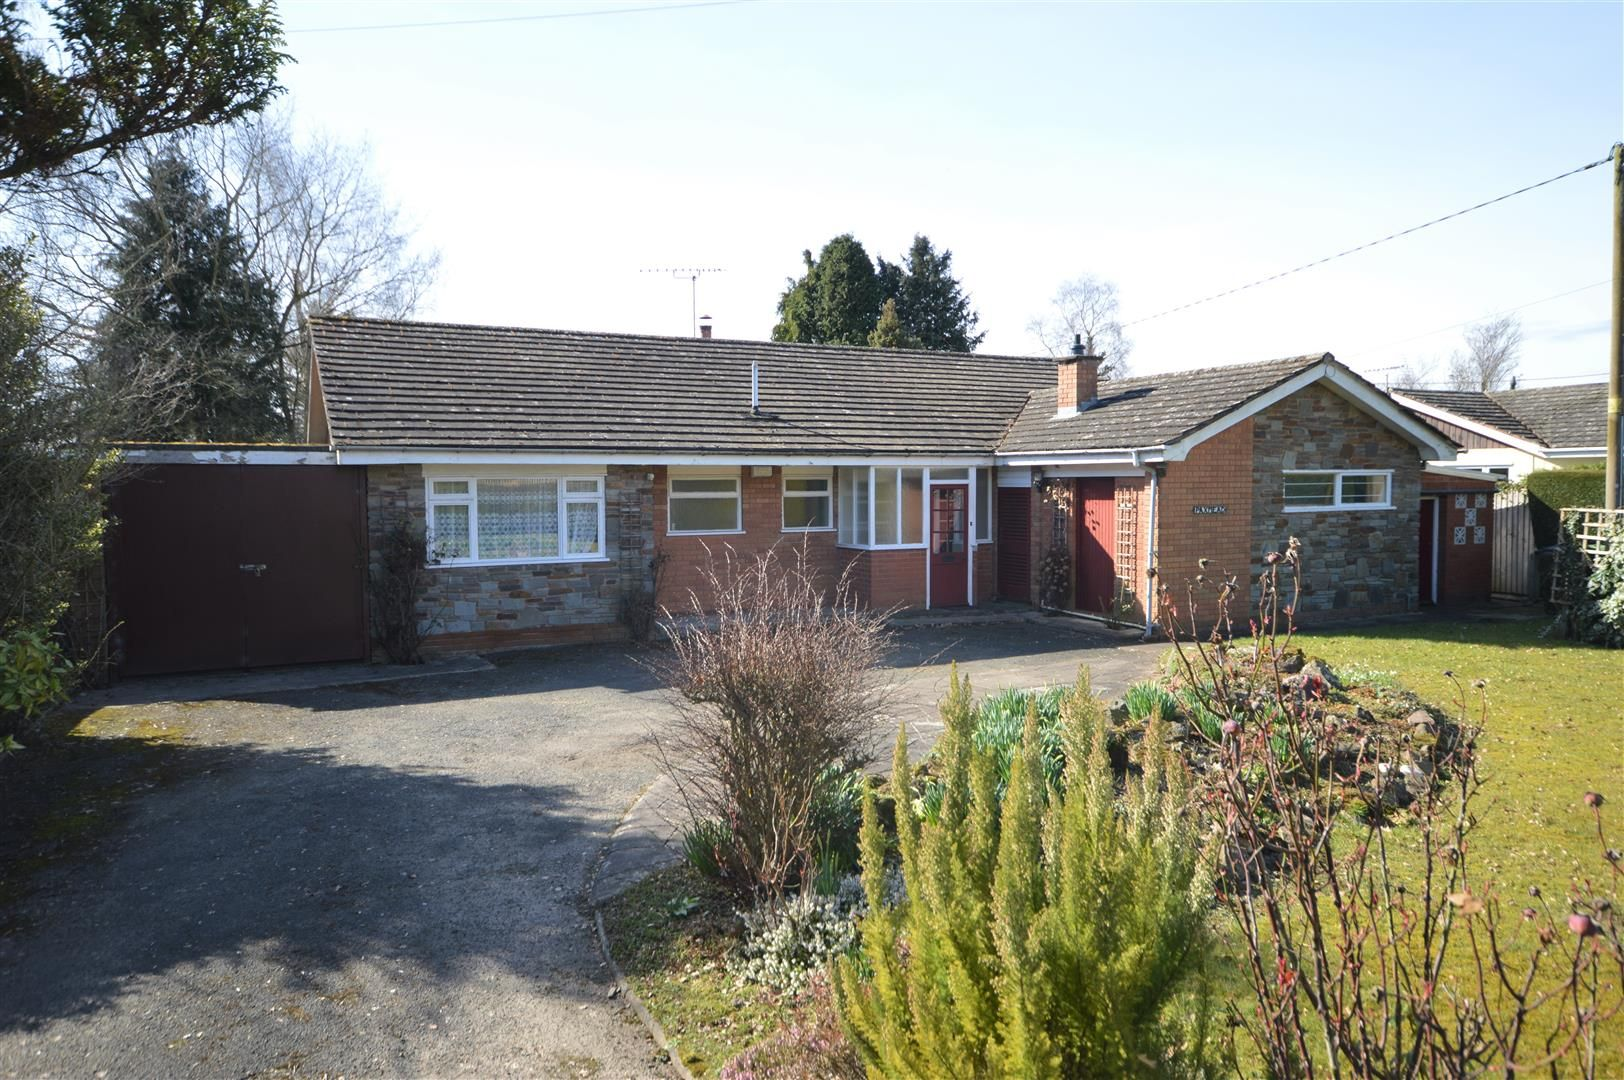 3 bed detached bungalow for sale in Kingsland, HR6